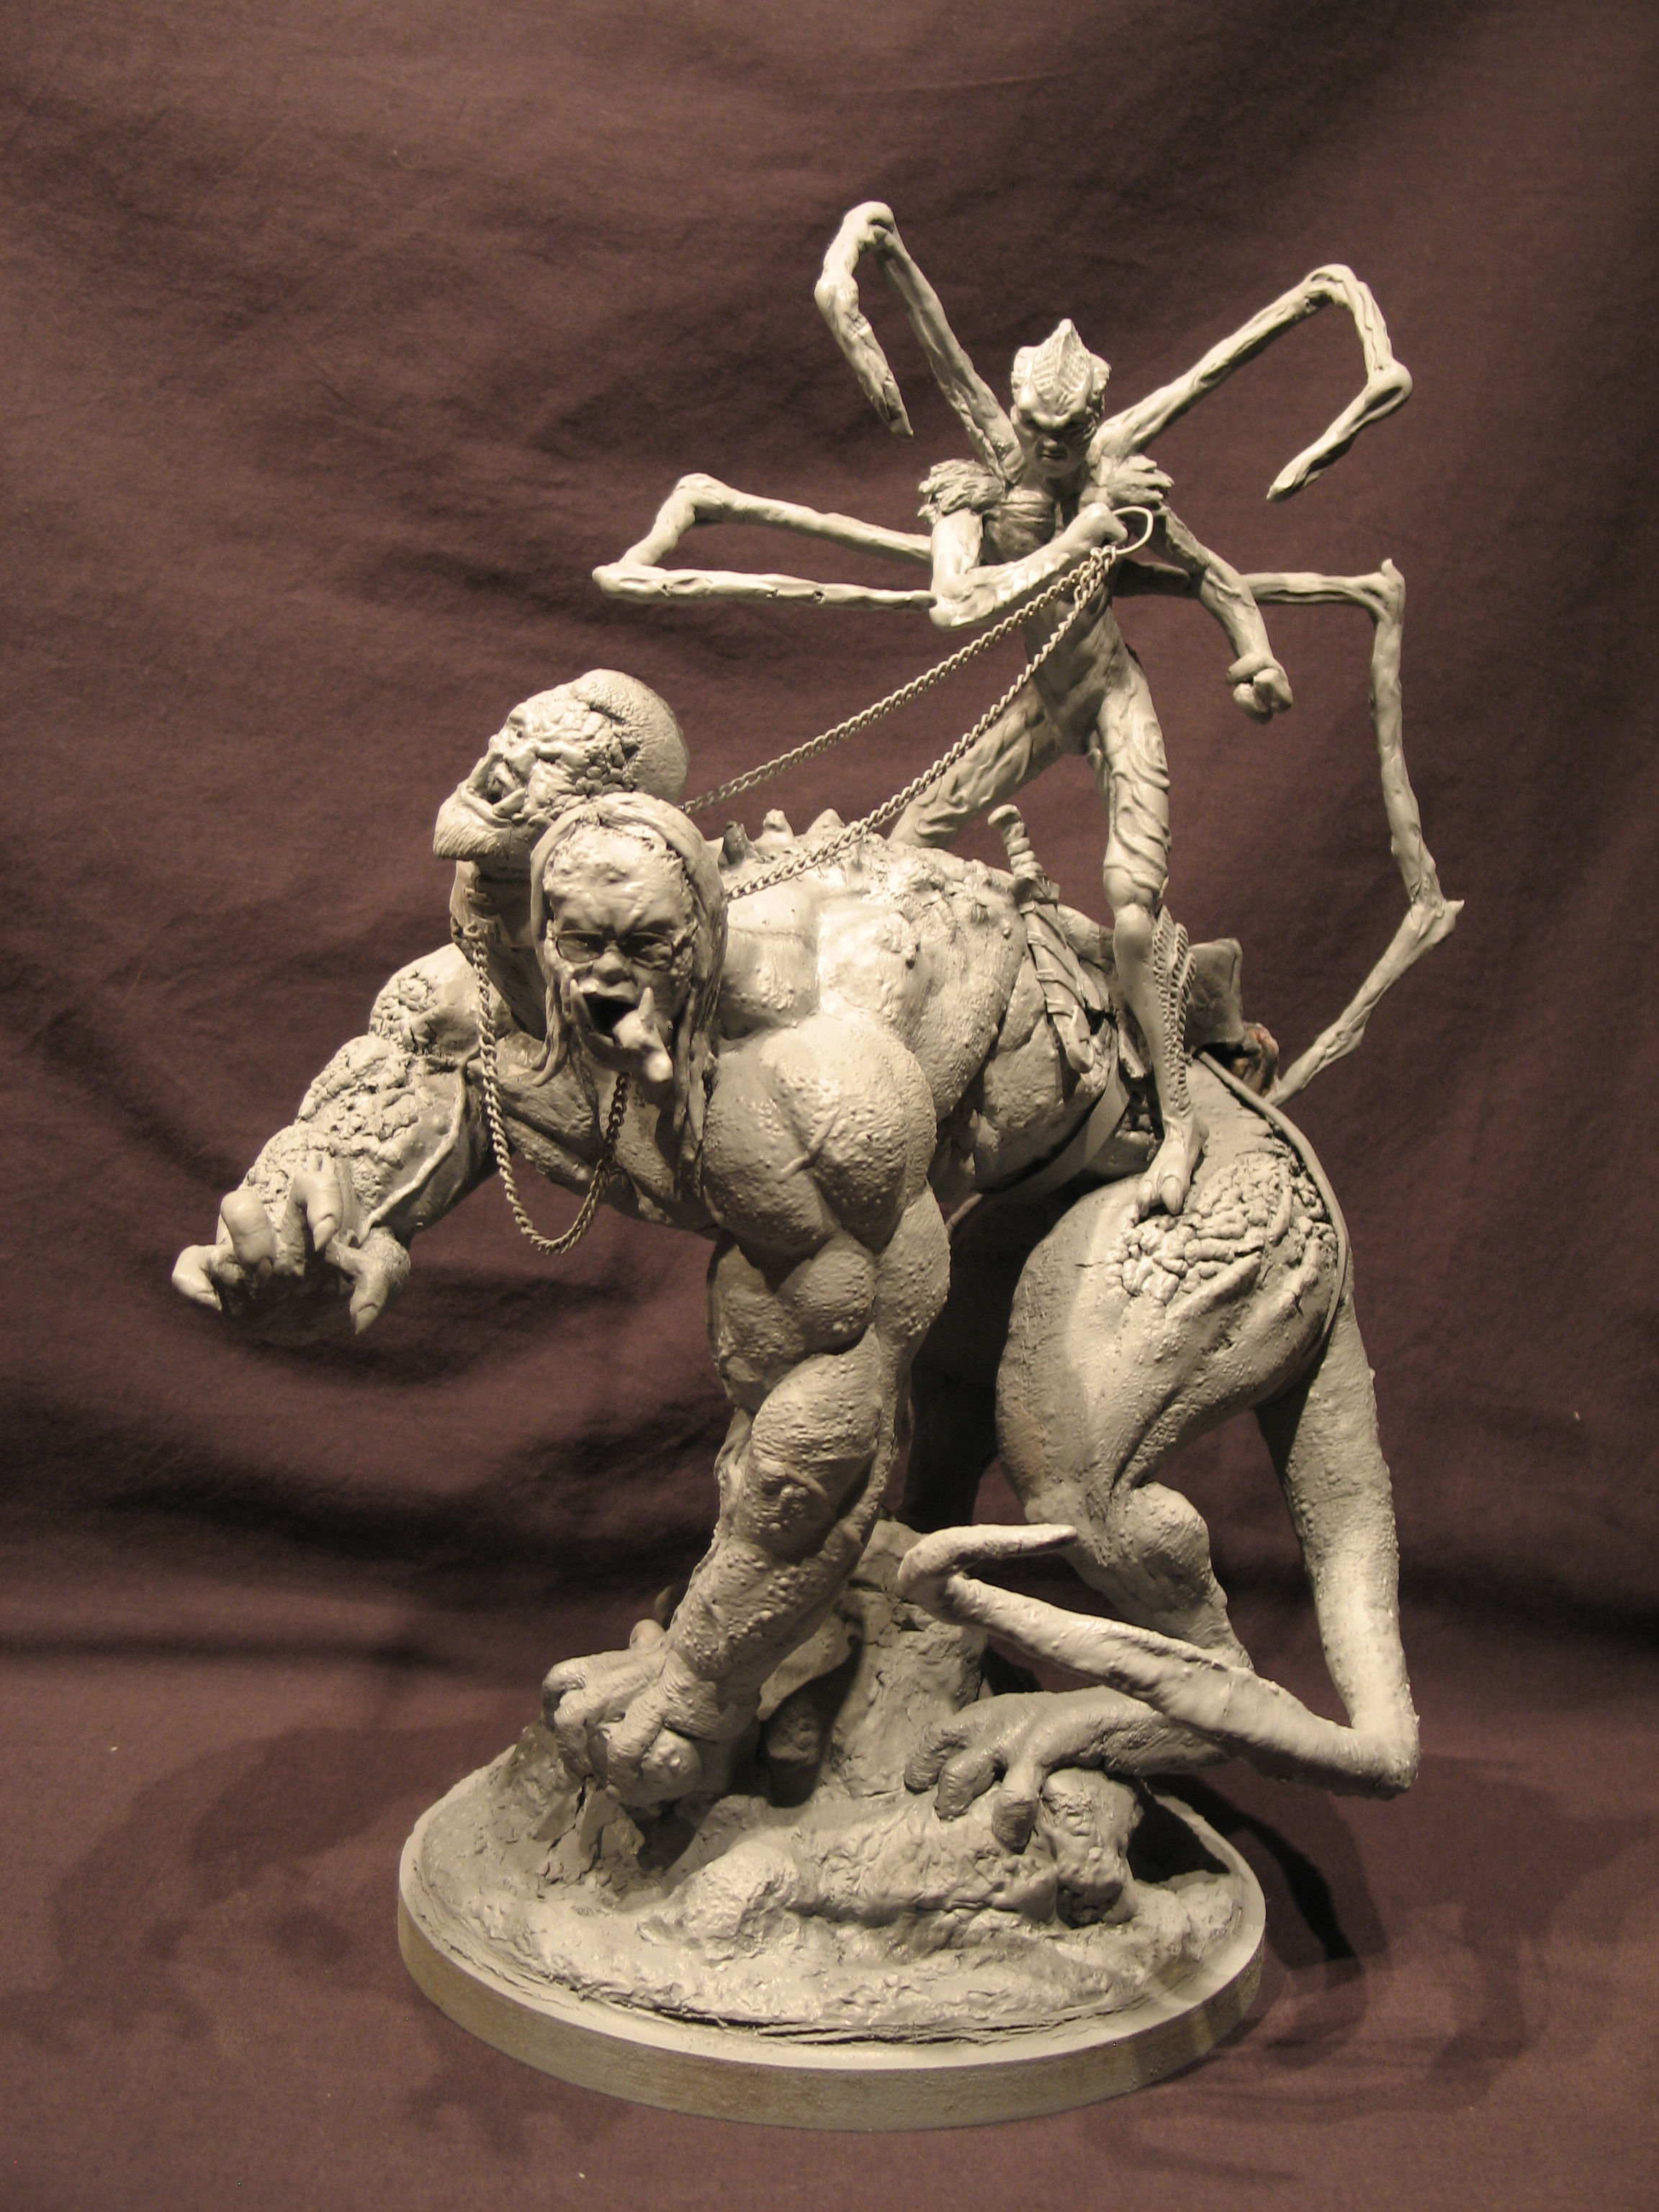 Spiderzero Riding the Shiflett Monster (Concours Shiflett 2) S153a